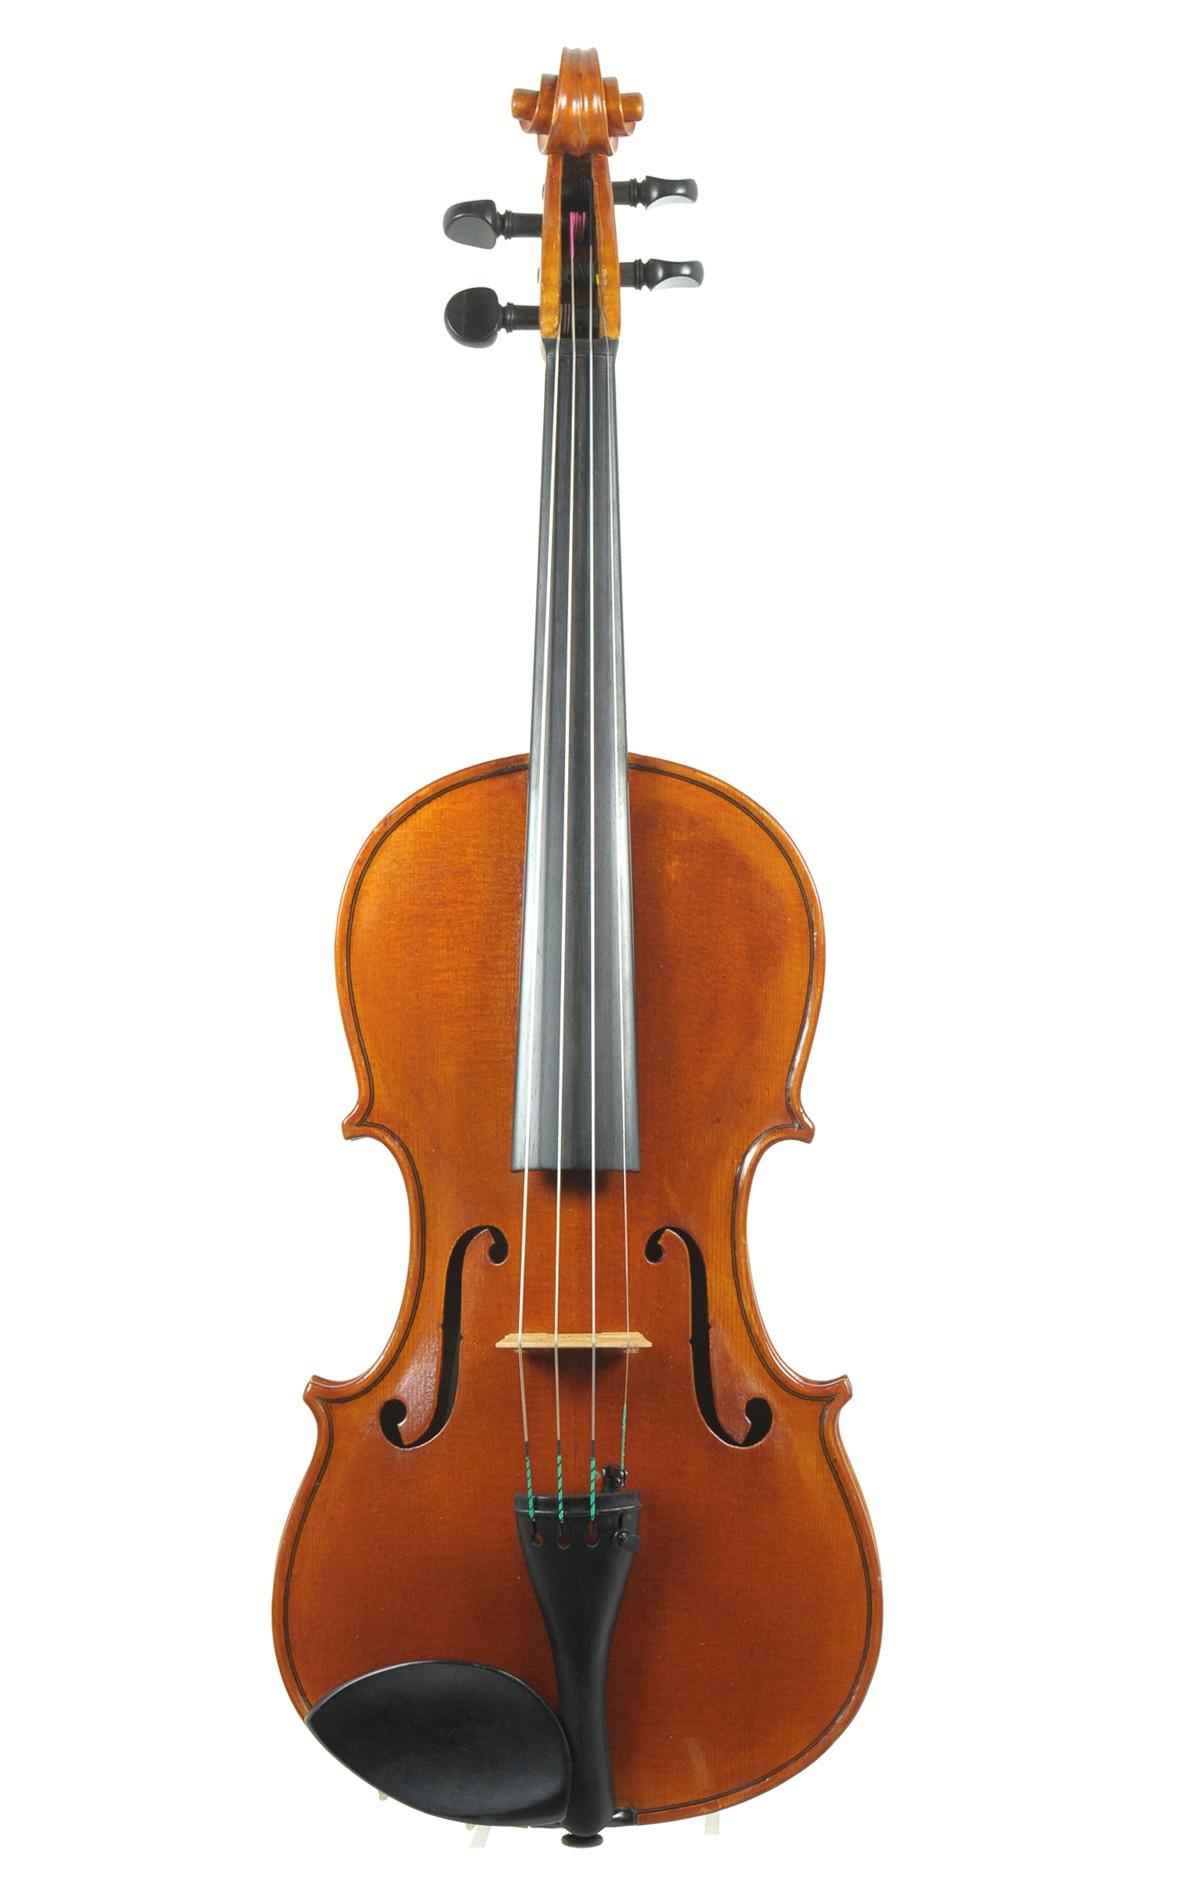 Italienische Geige, 1970, Benvenuto Botturi (Zertifikat B. Botturi)